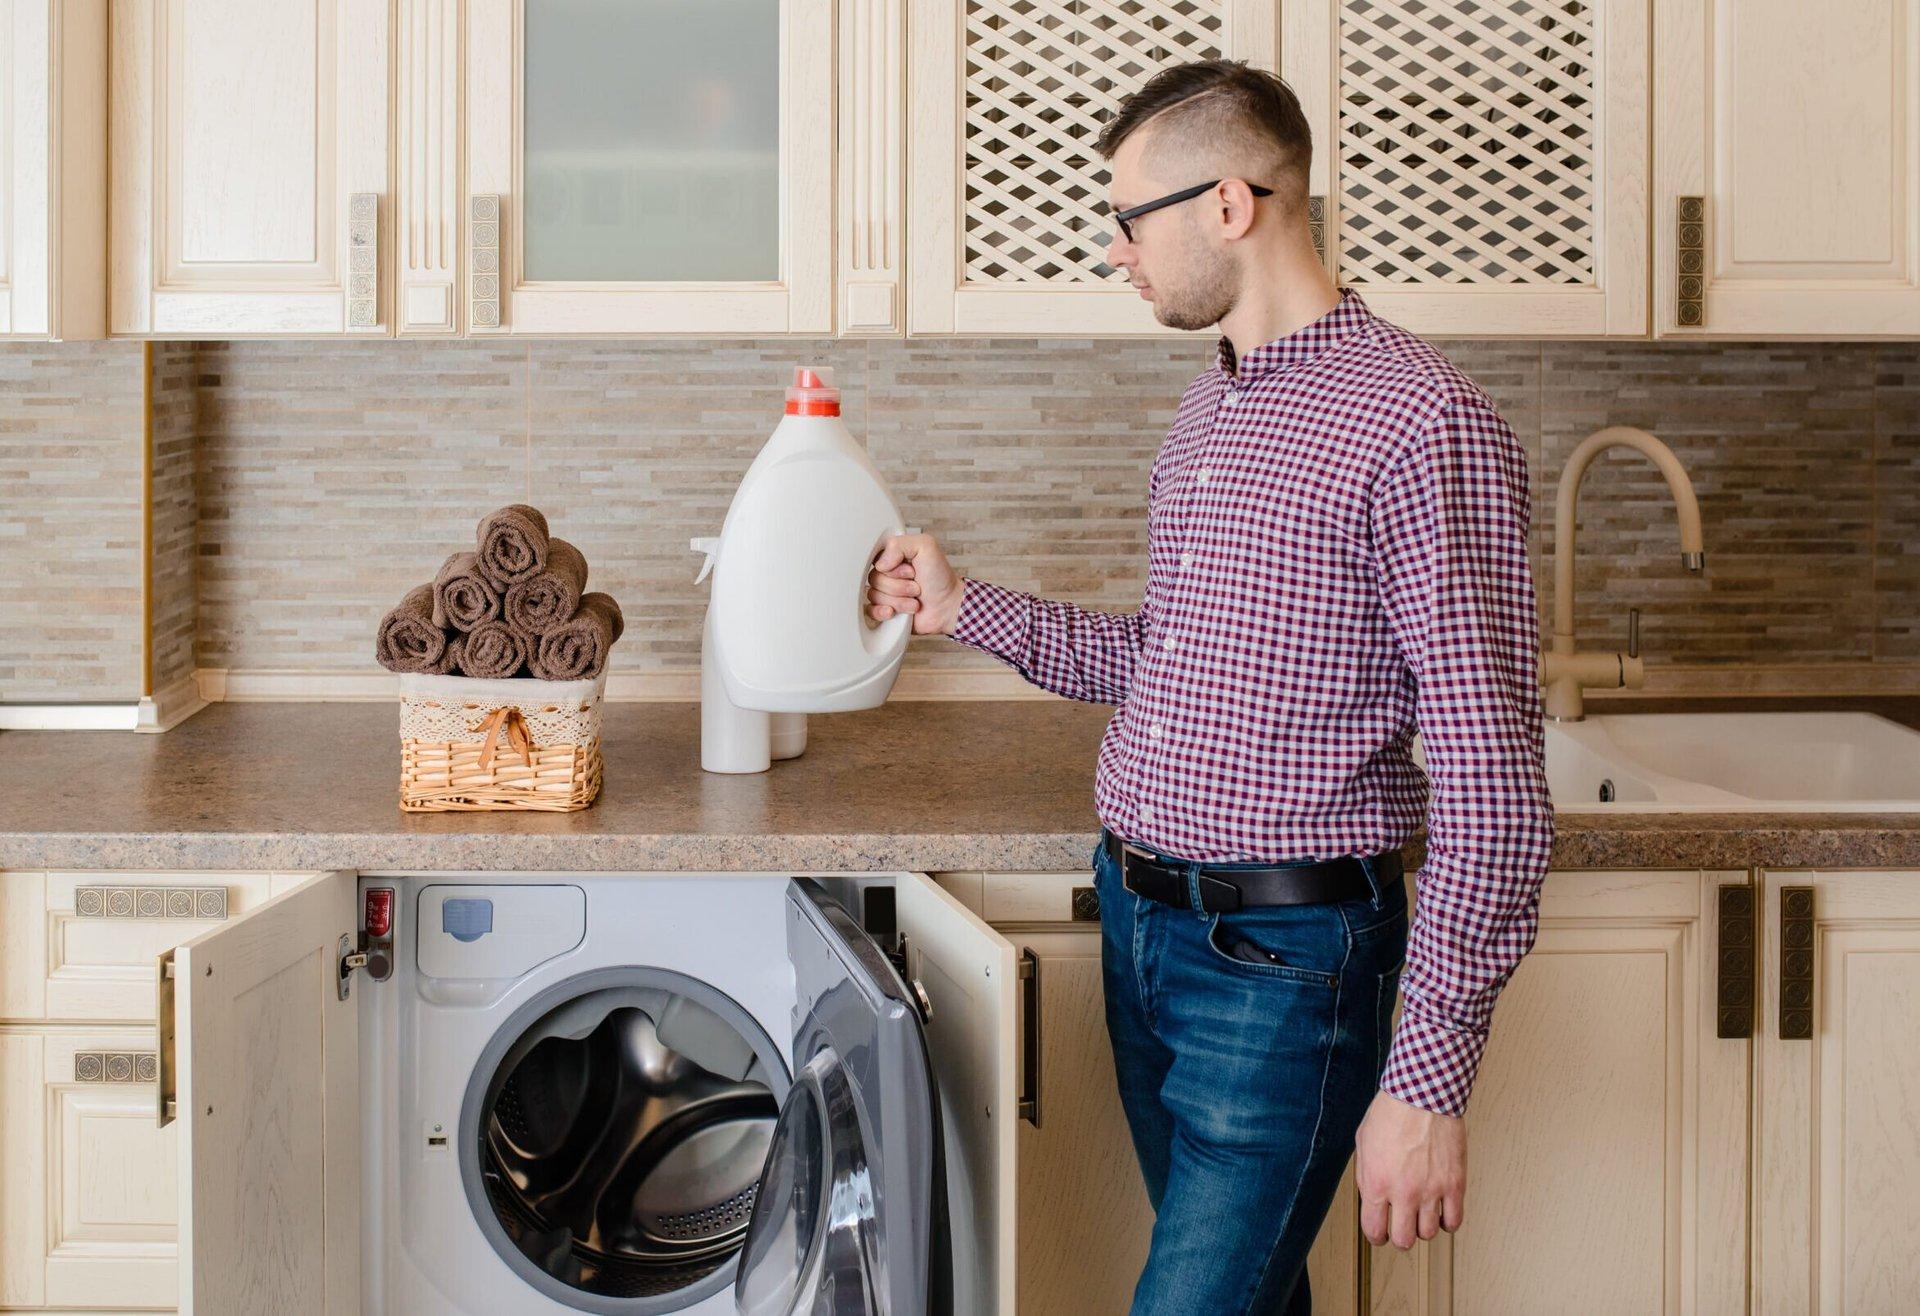 Man holding laundry detergent